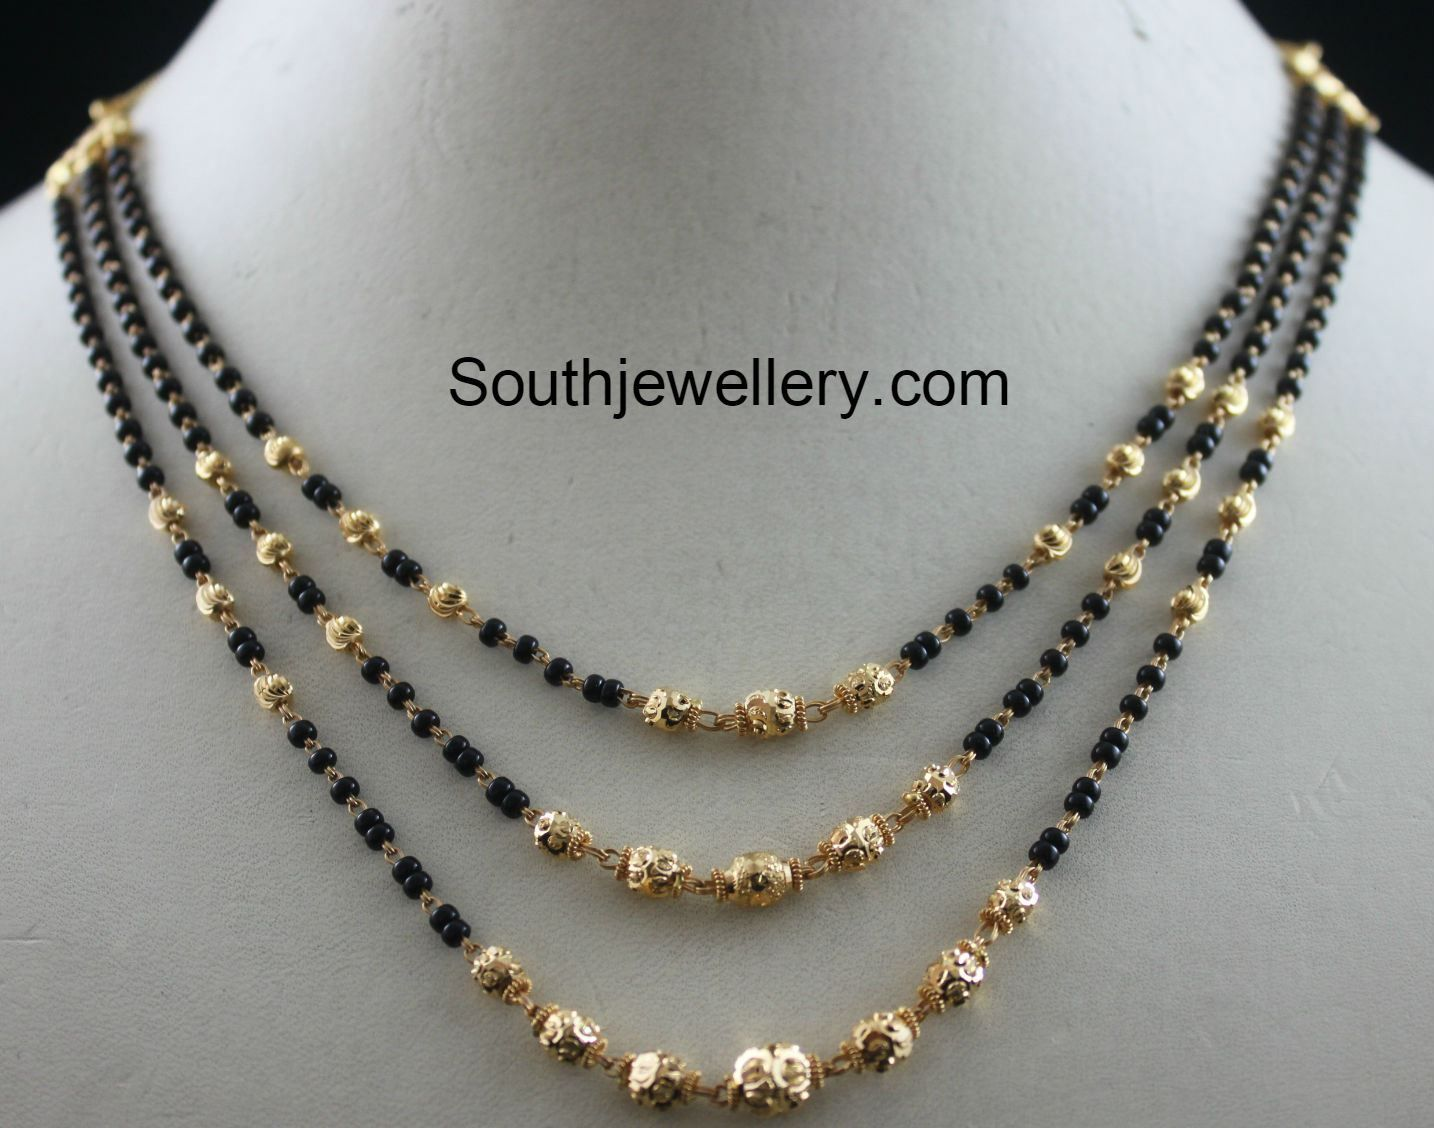 mangalsutra | Mangalsutra | Pinterest | India jewelry, India and Jewel